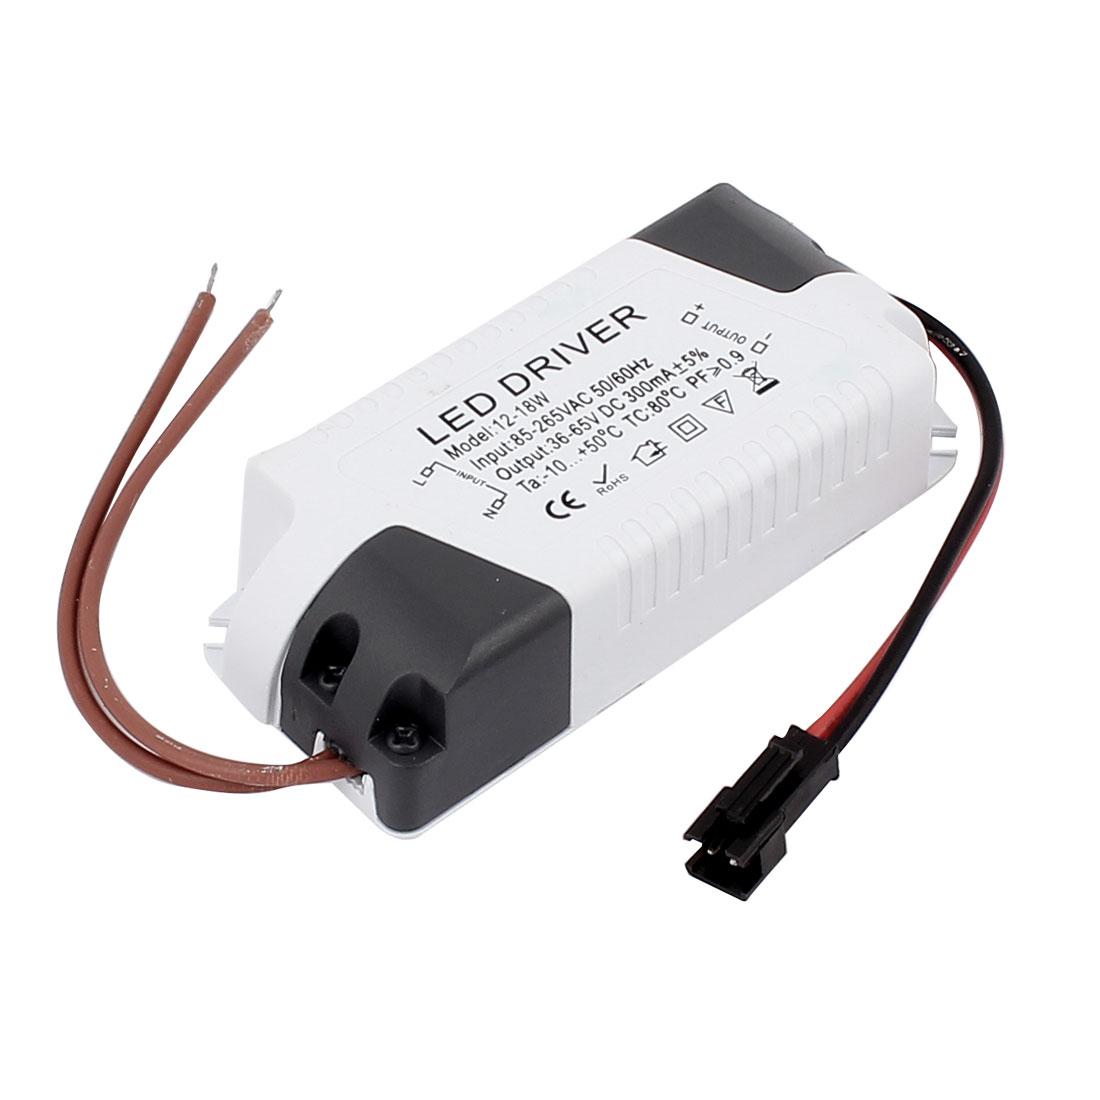 AC85-265V to DC36-65V 12-18W Transformer Ceiling Lamp LED Driver Power Supply